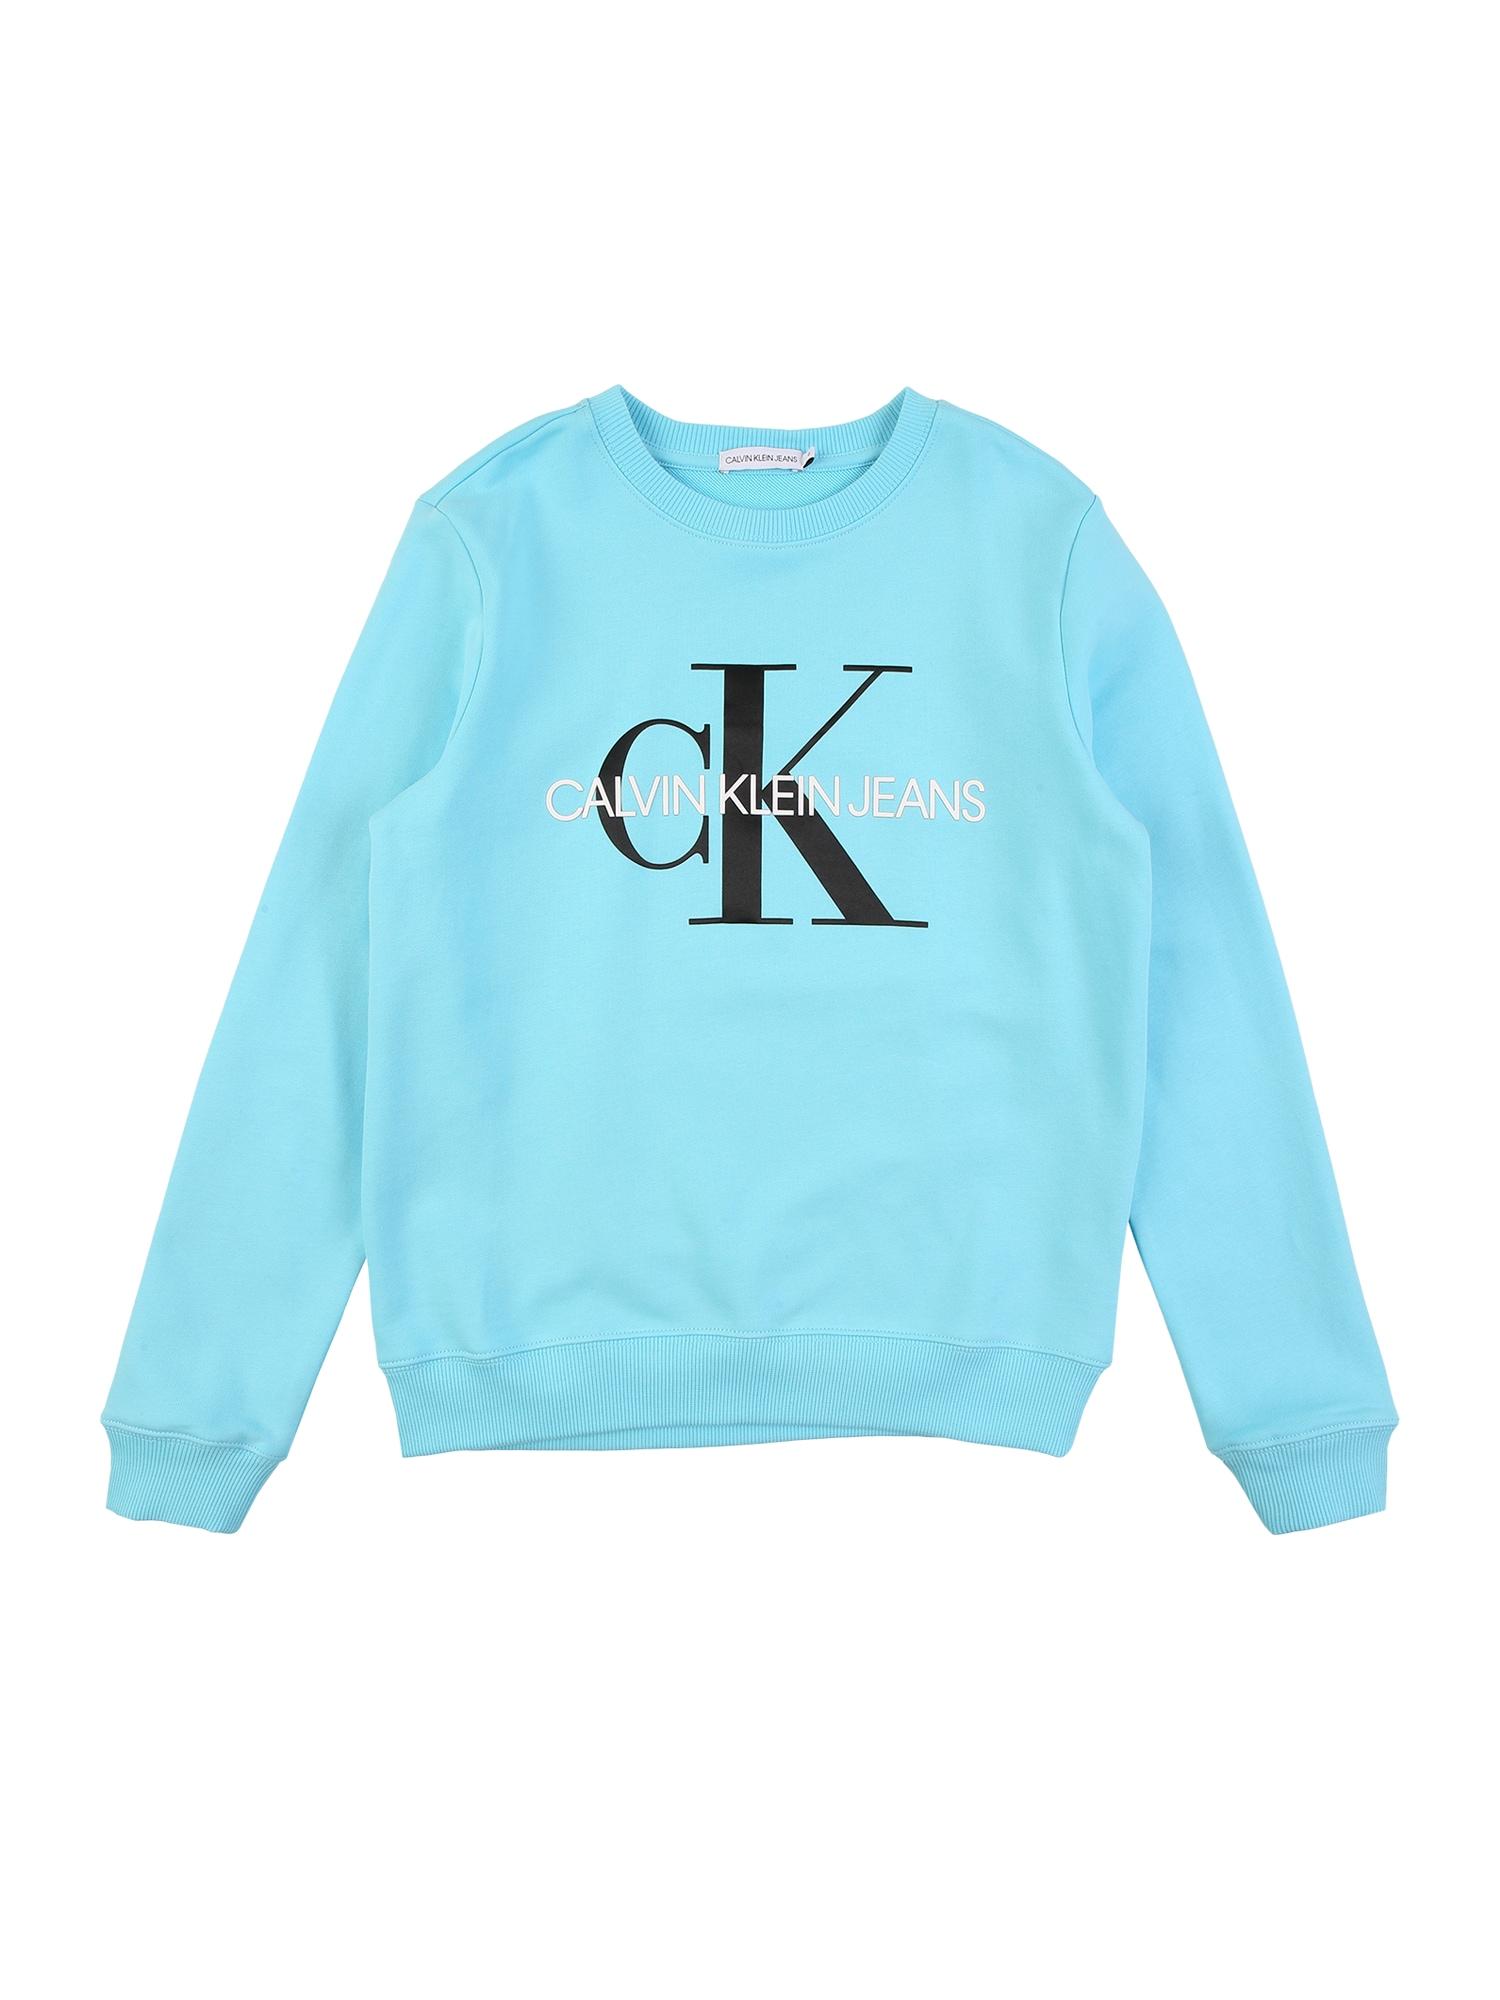 Calvin Klein Jeans Mikina  světlemodrá / bílá / černá